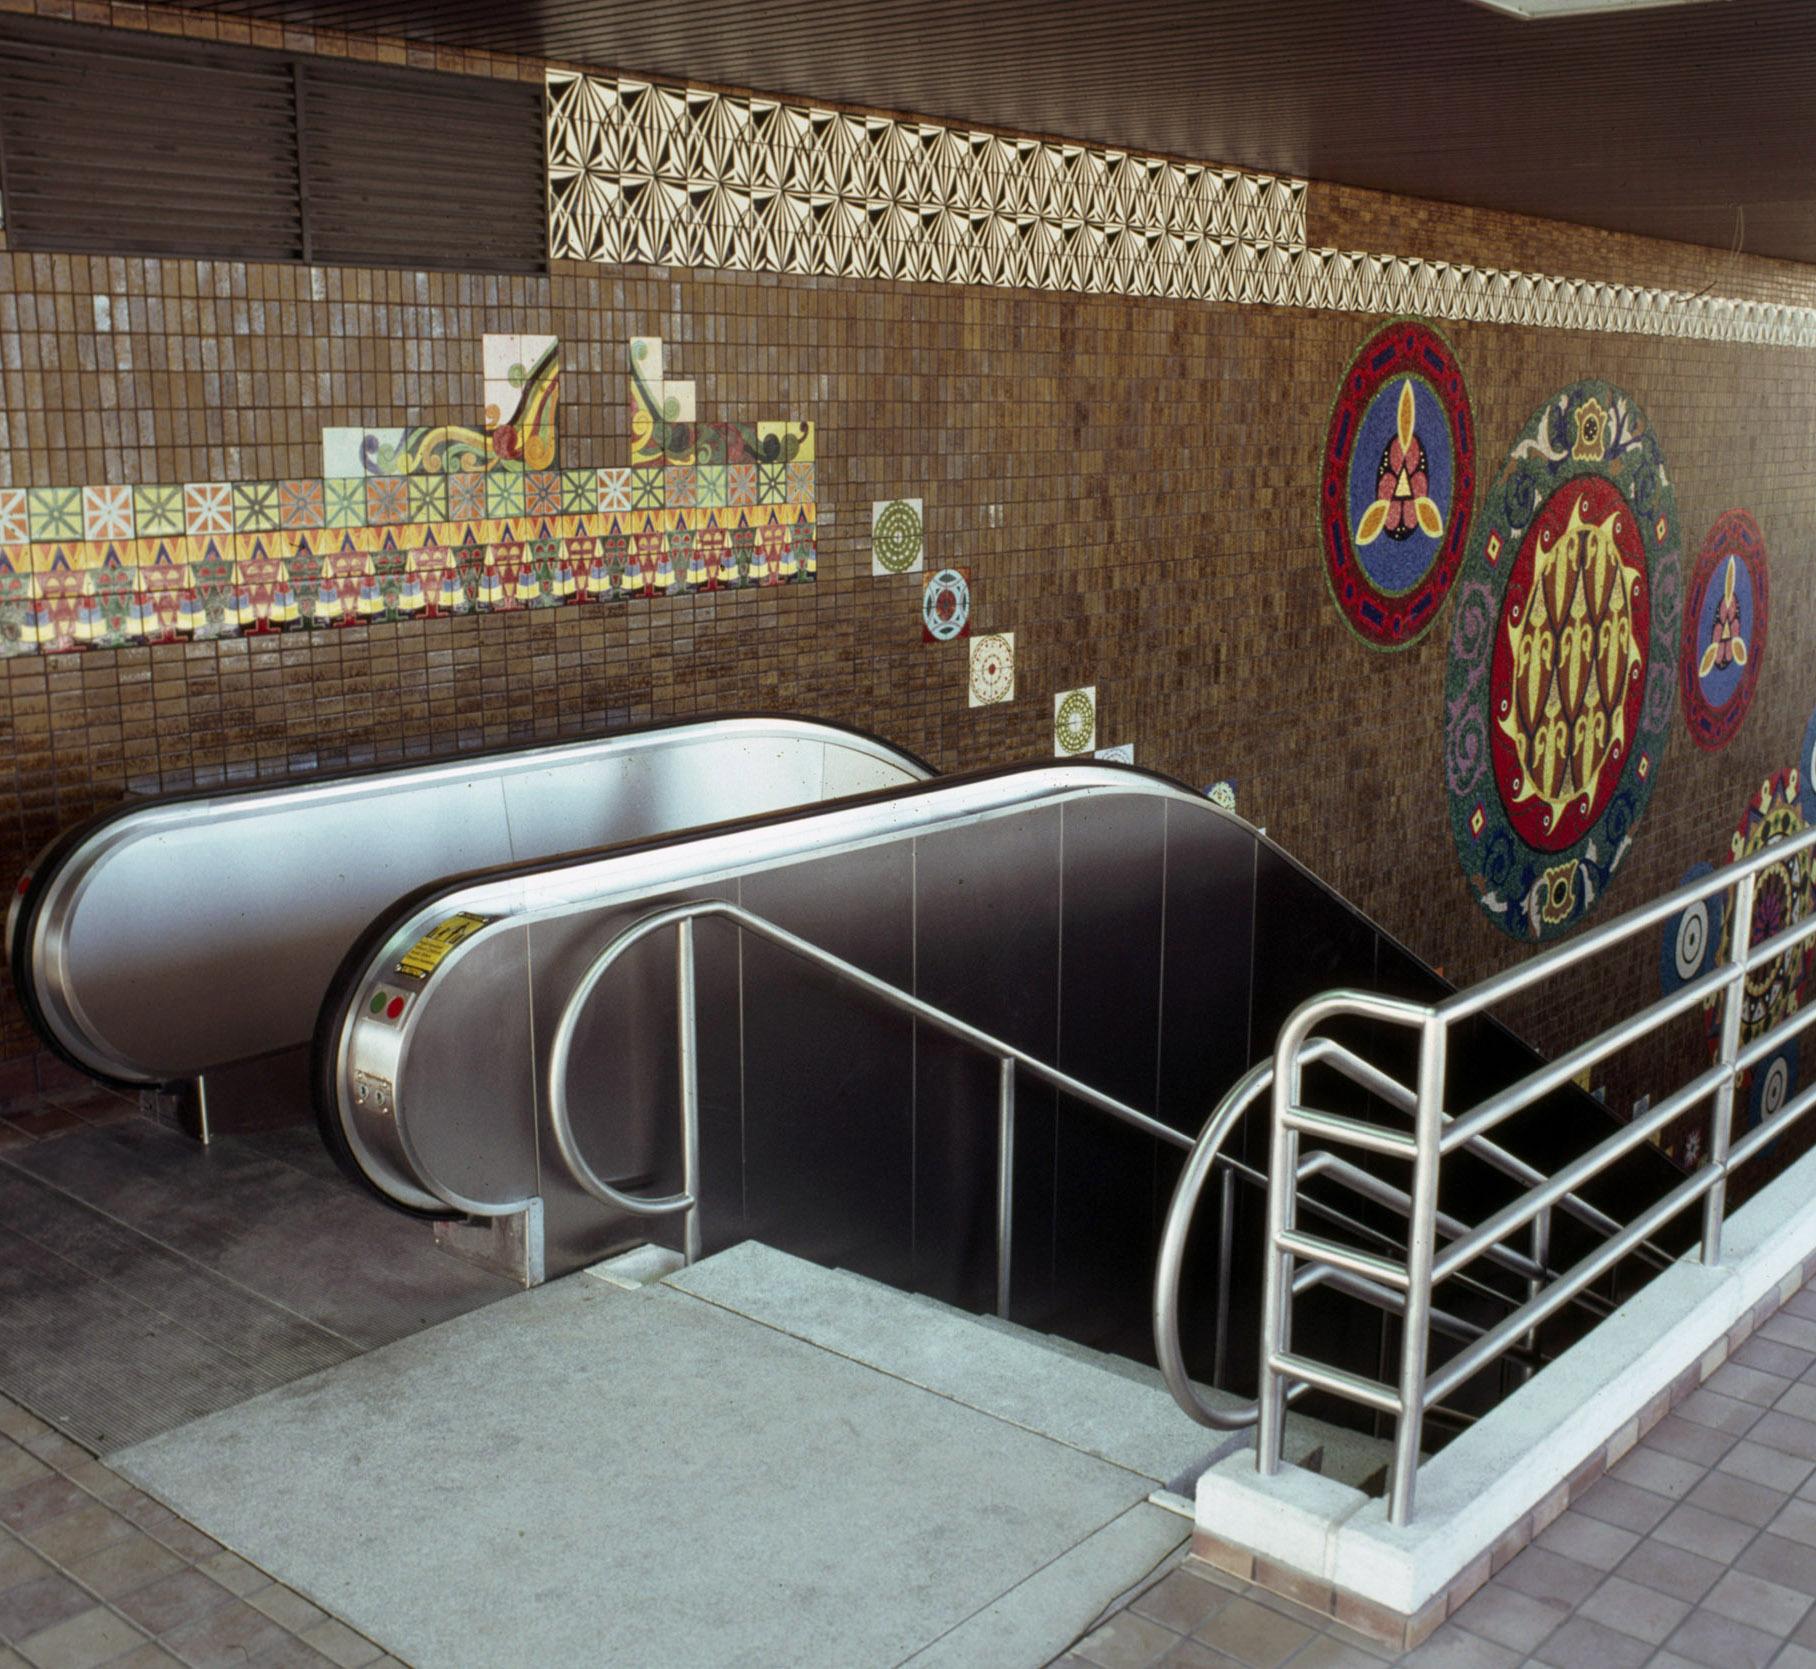 1984 Humboldt-Hospital Station, Buffalo